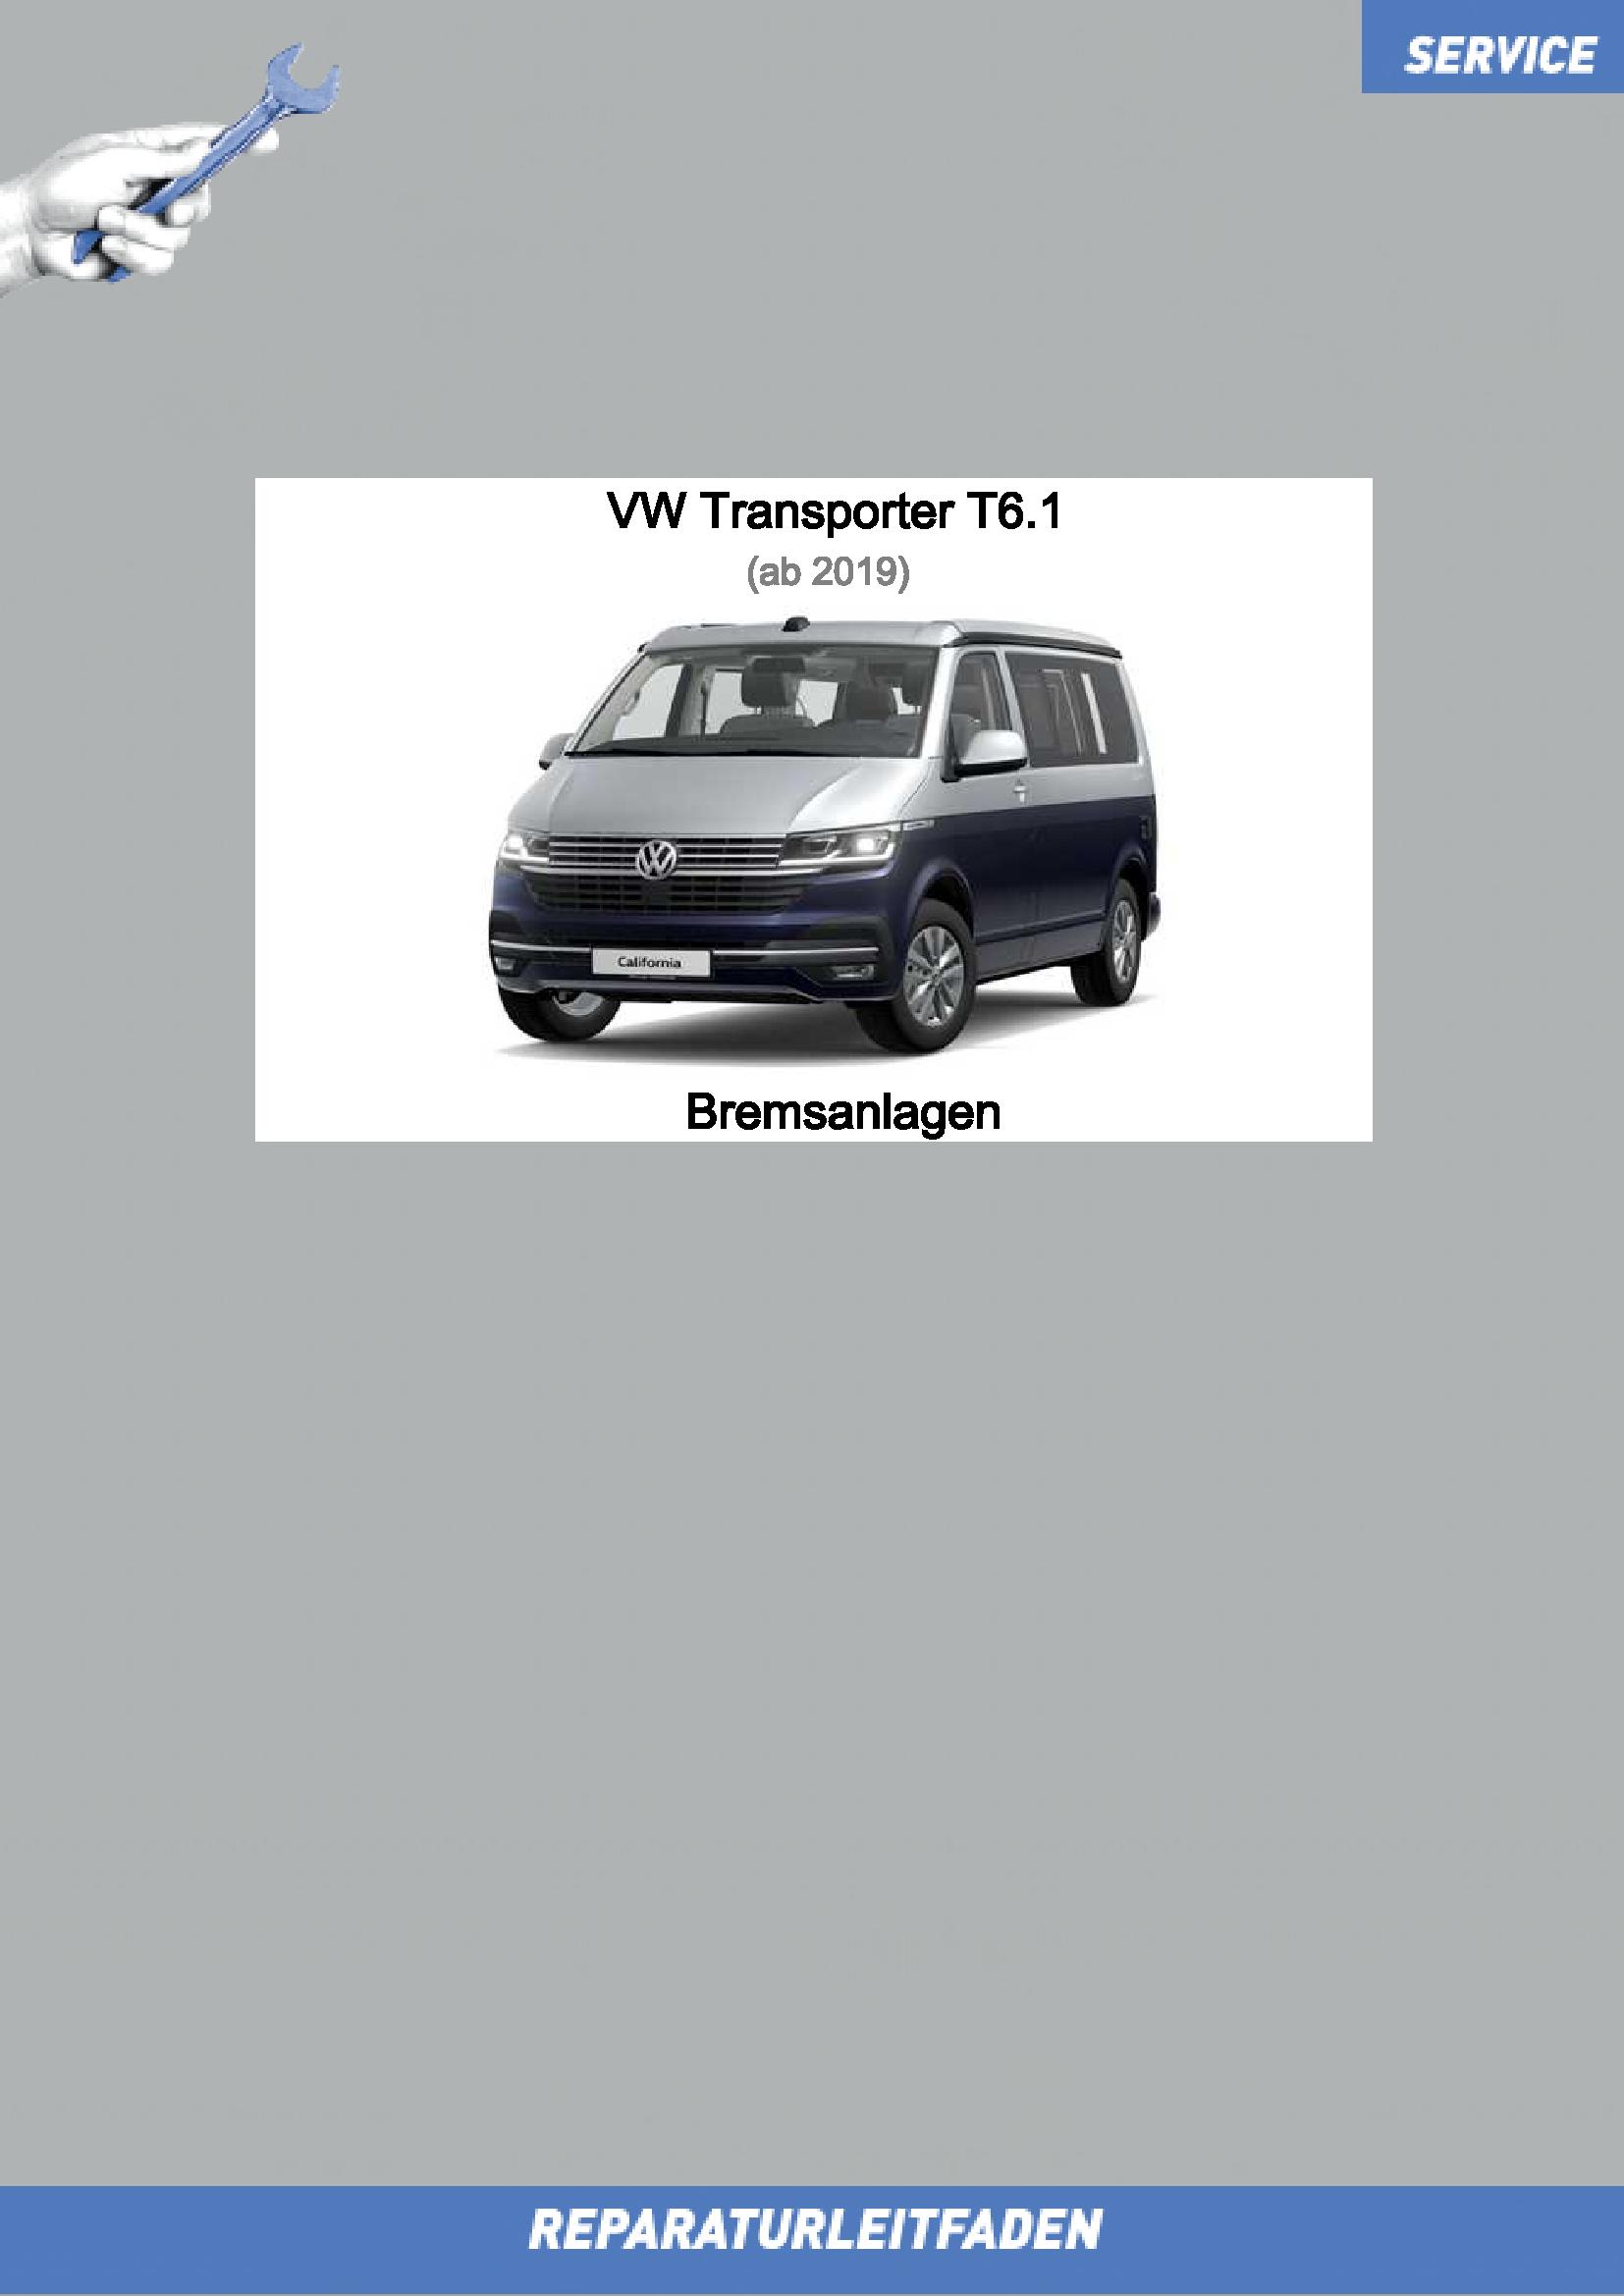 vw-t6-sh_sj-0005-bremsanlagen_1.png